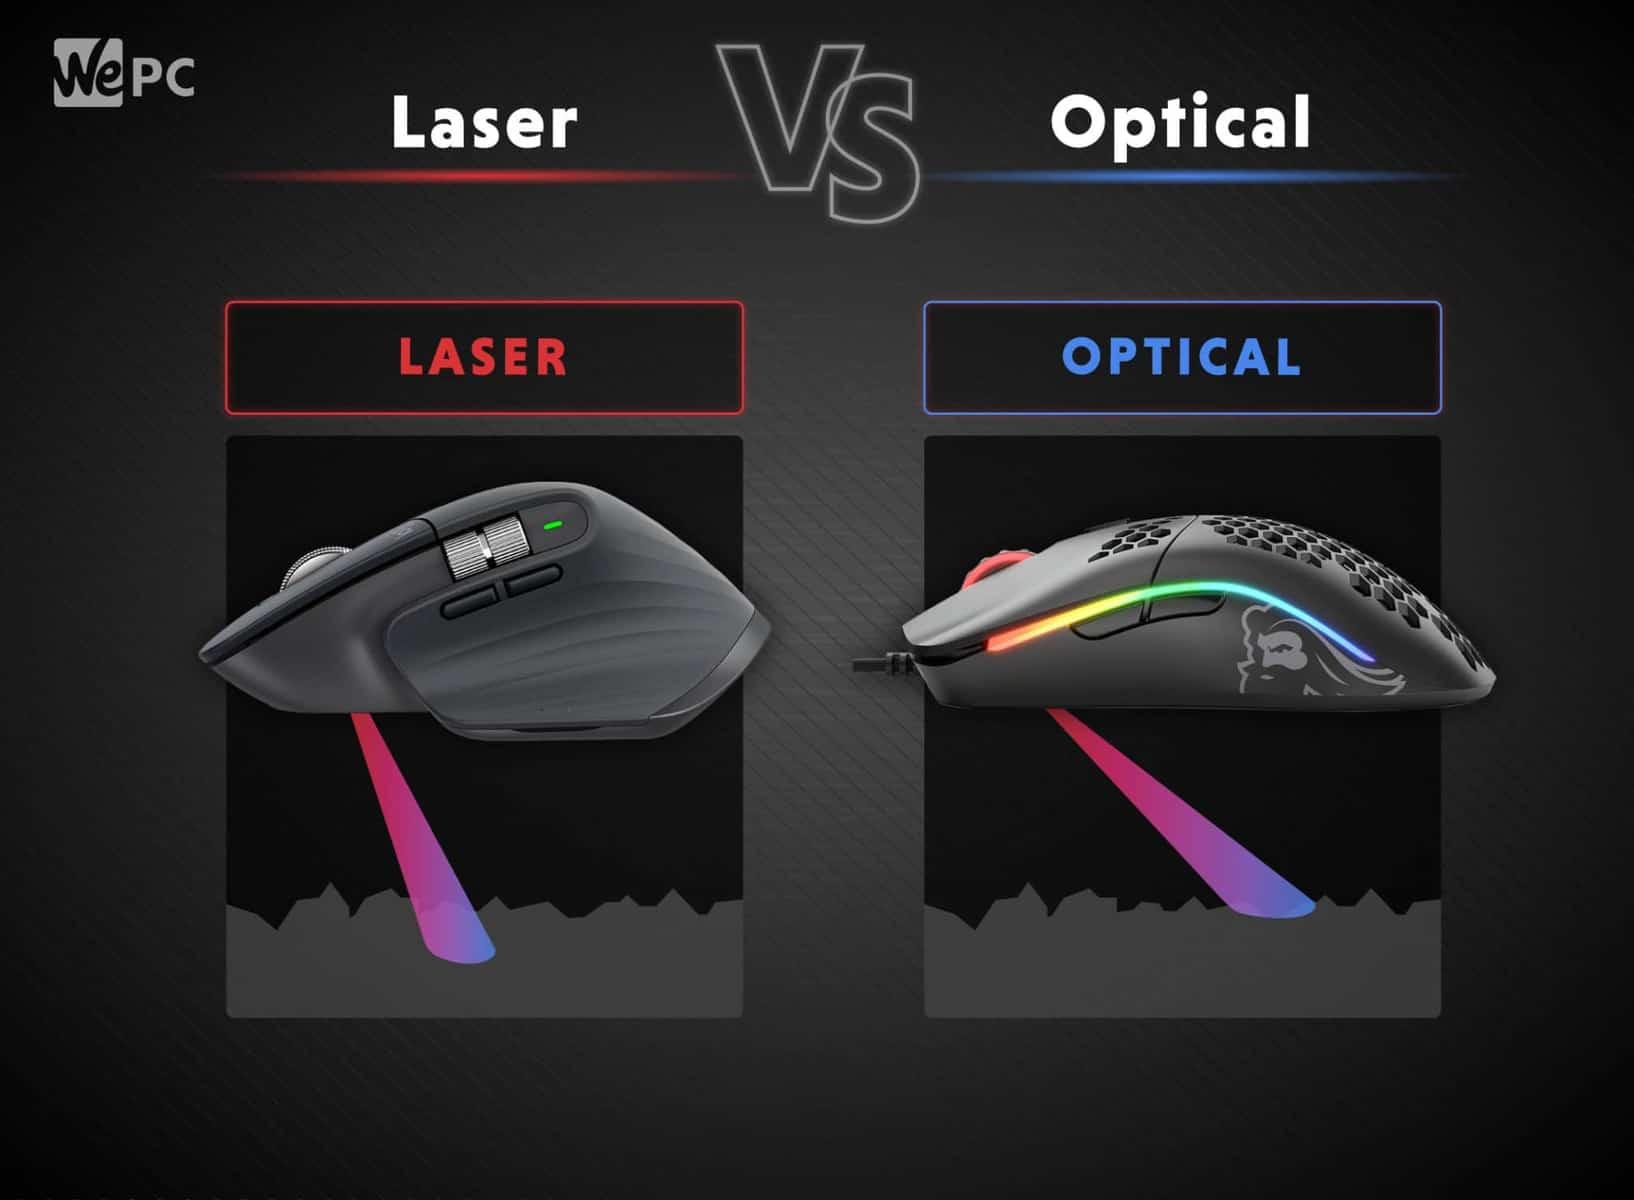 Laser vs Optical